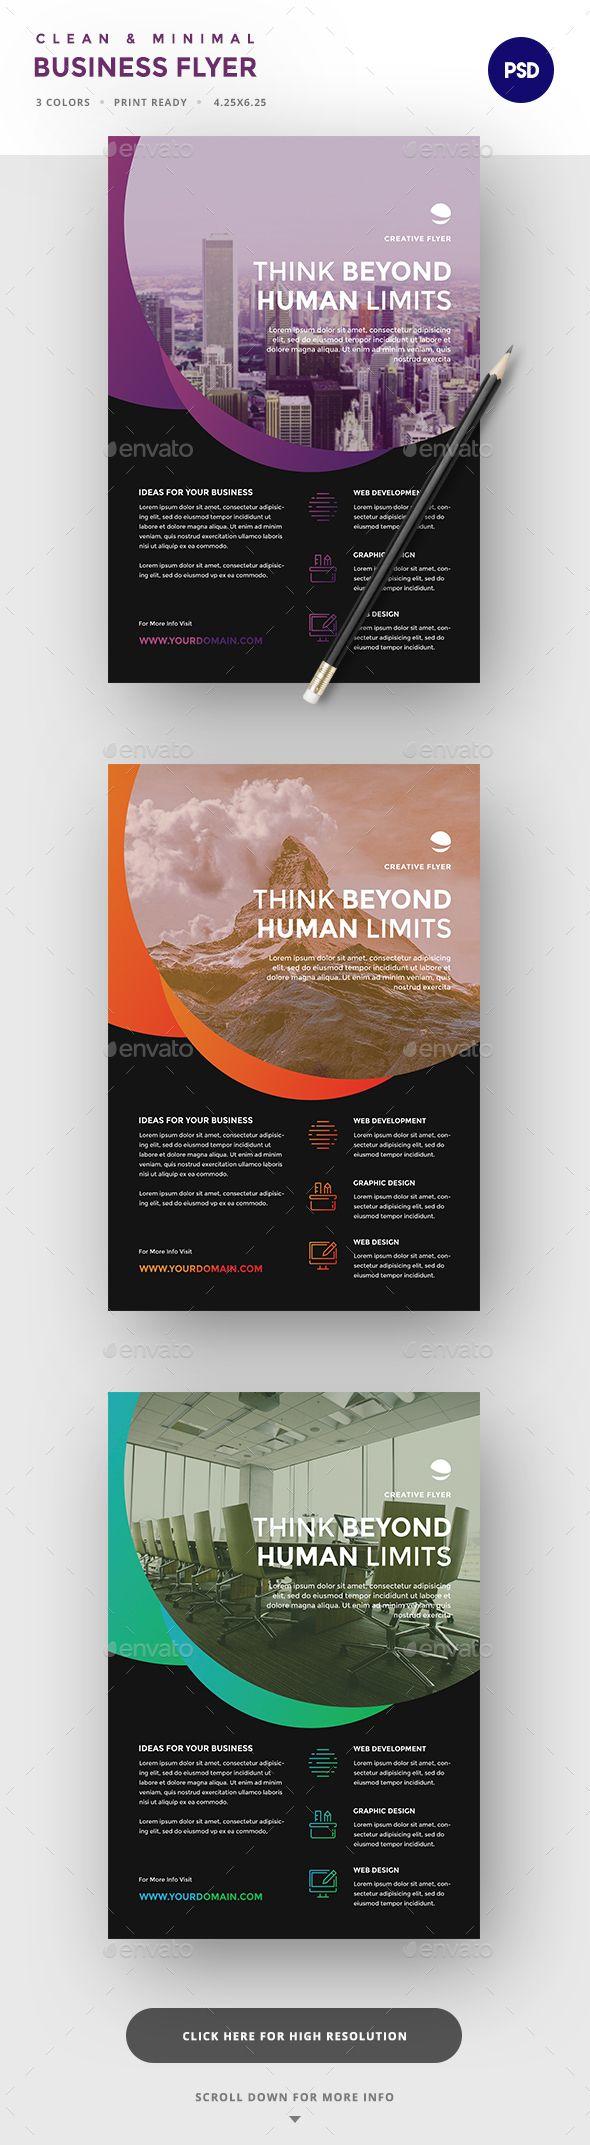 Business Flyer Design Template - Corporate Flyers Design Template PSD. Download here: https://graphicriver.net/item/business-flyer/19357261?ref=yinkira